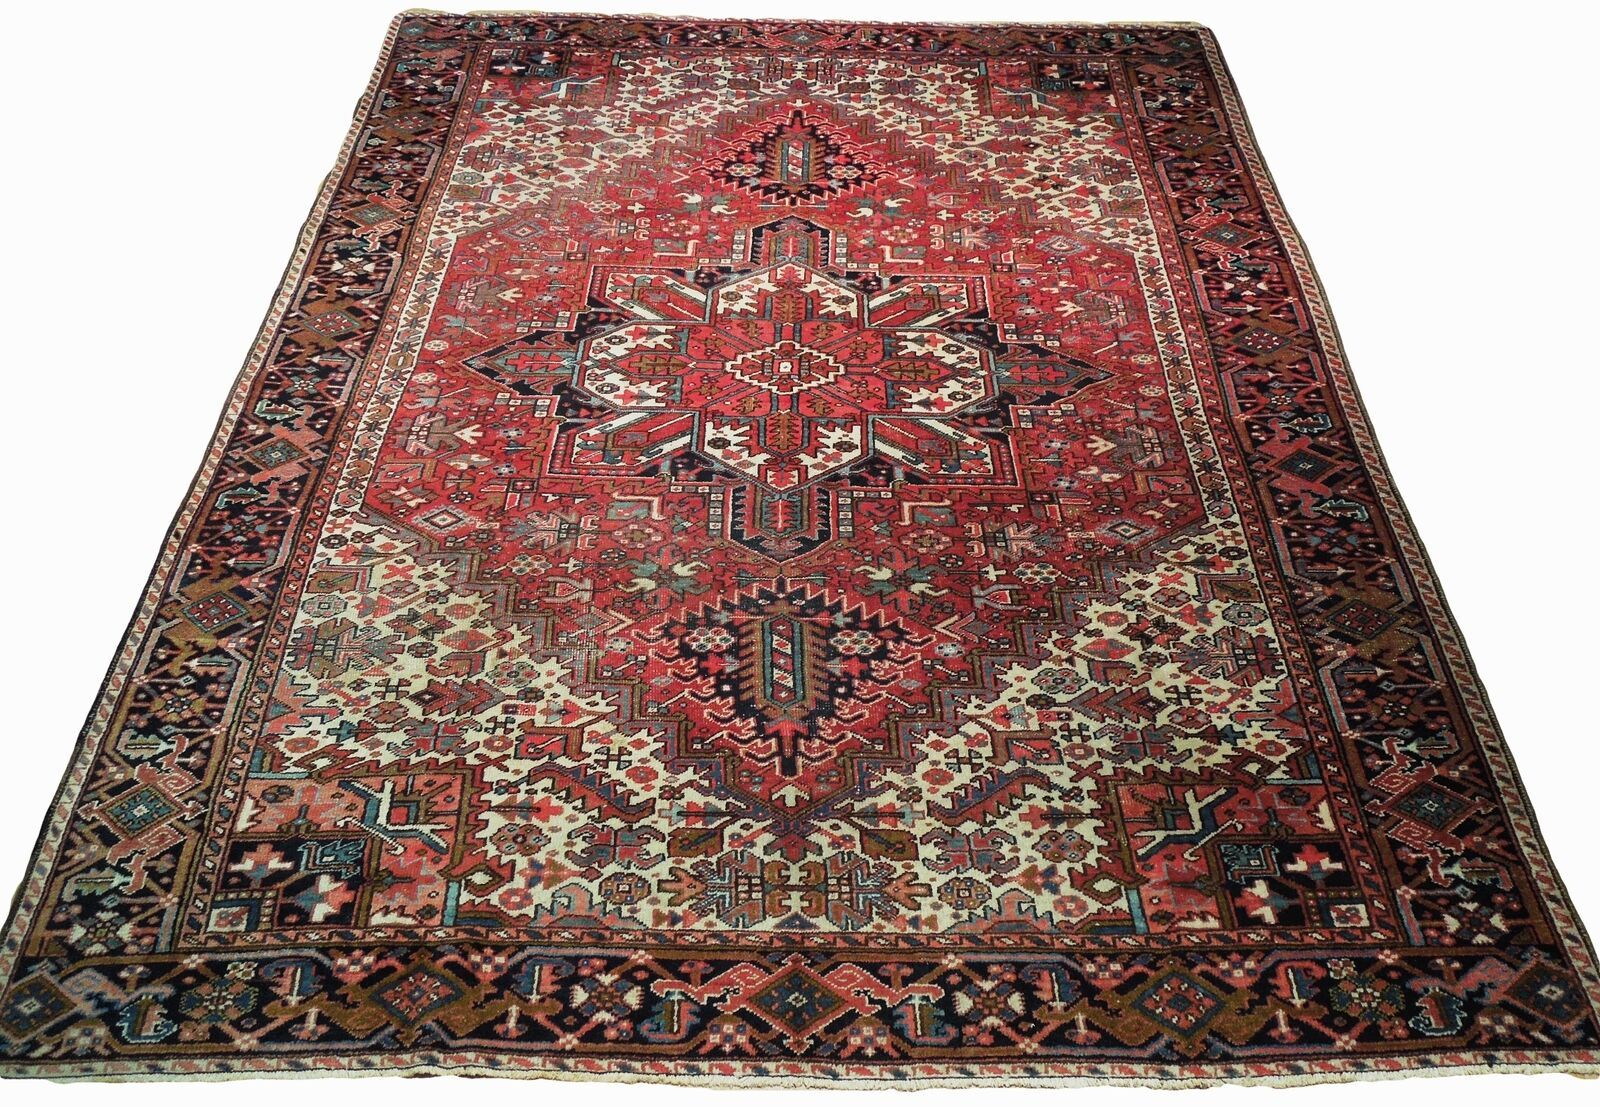 Normal Wear Semi-Antique Persian Handmade 9x12 Burgundy Heriz Wool Rug